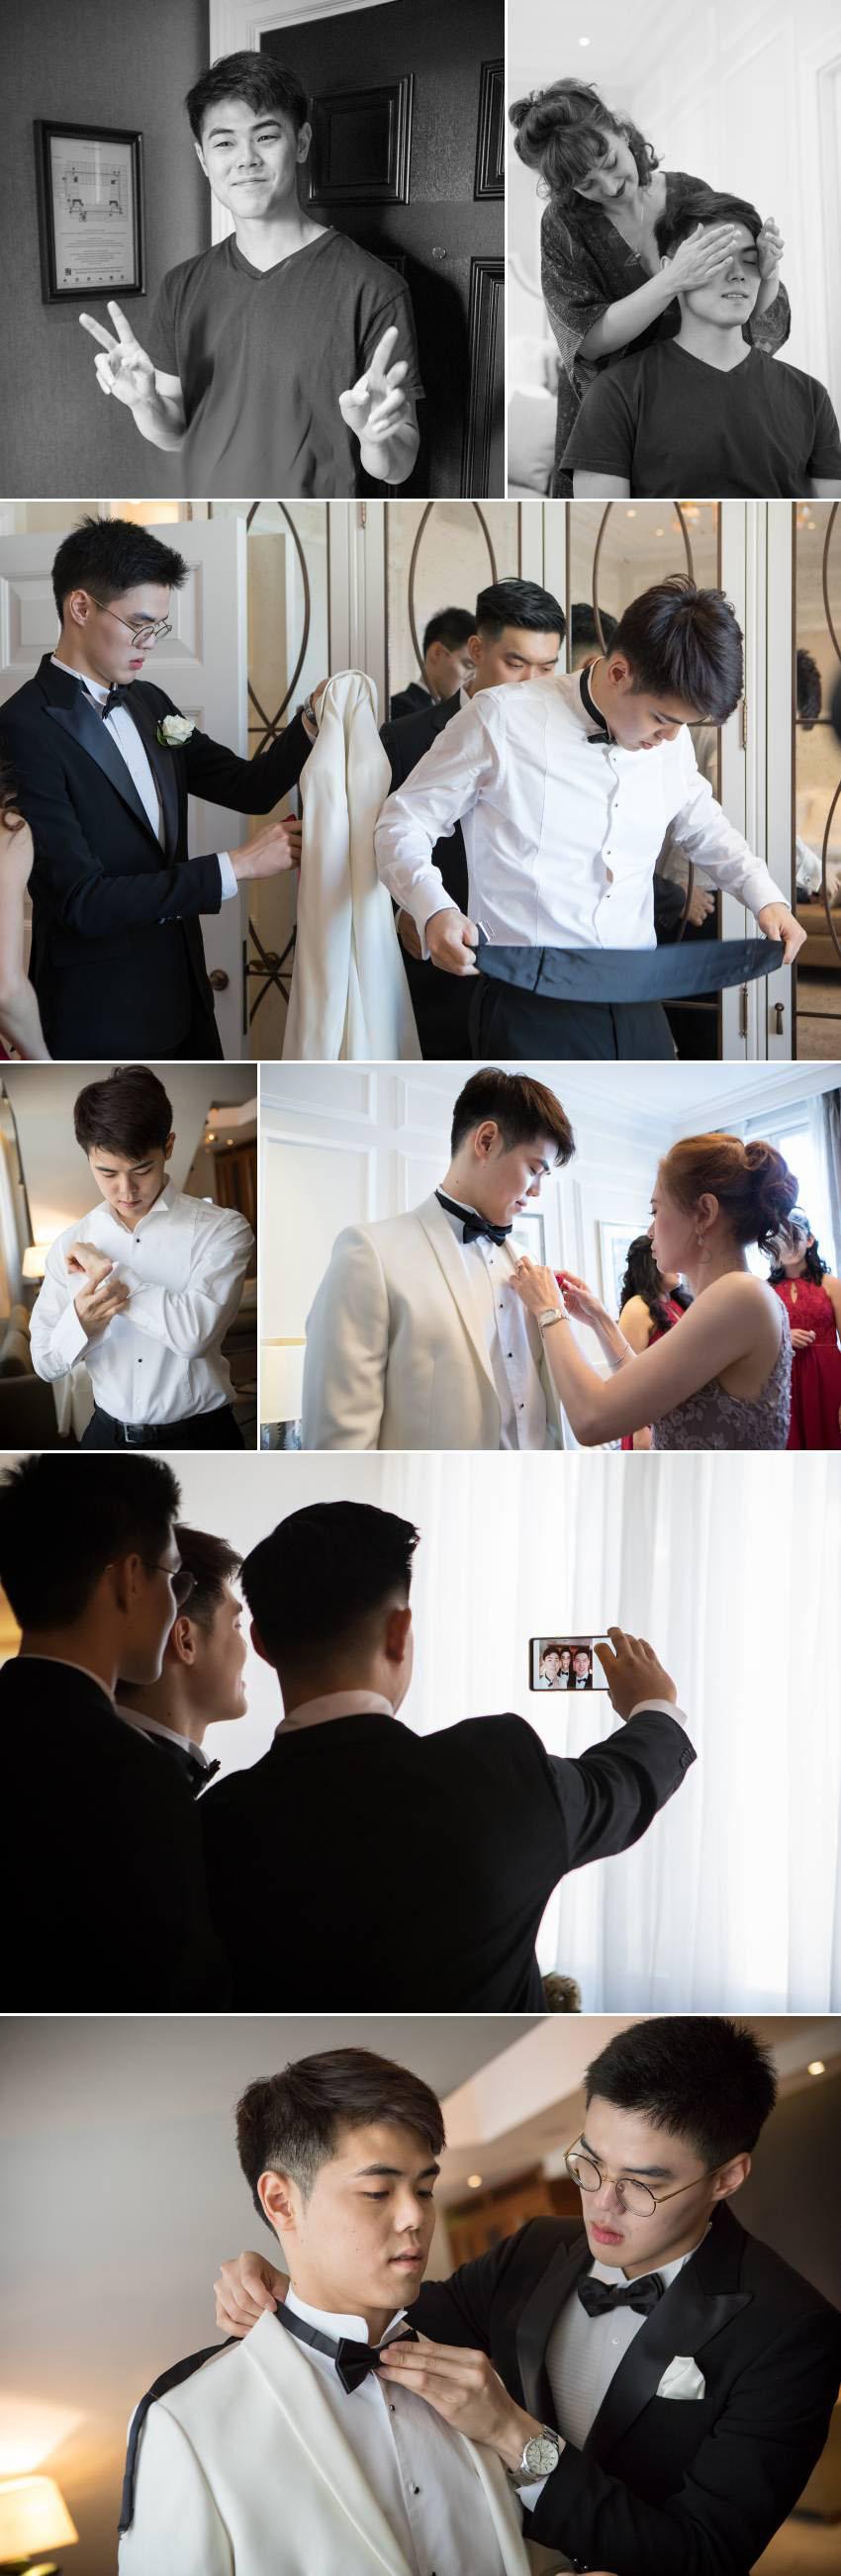 A Wedding at the Langham 04